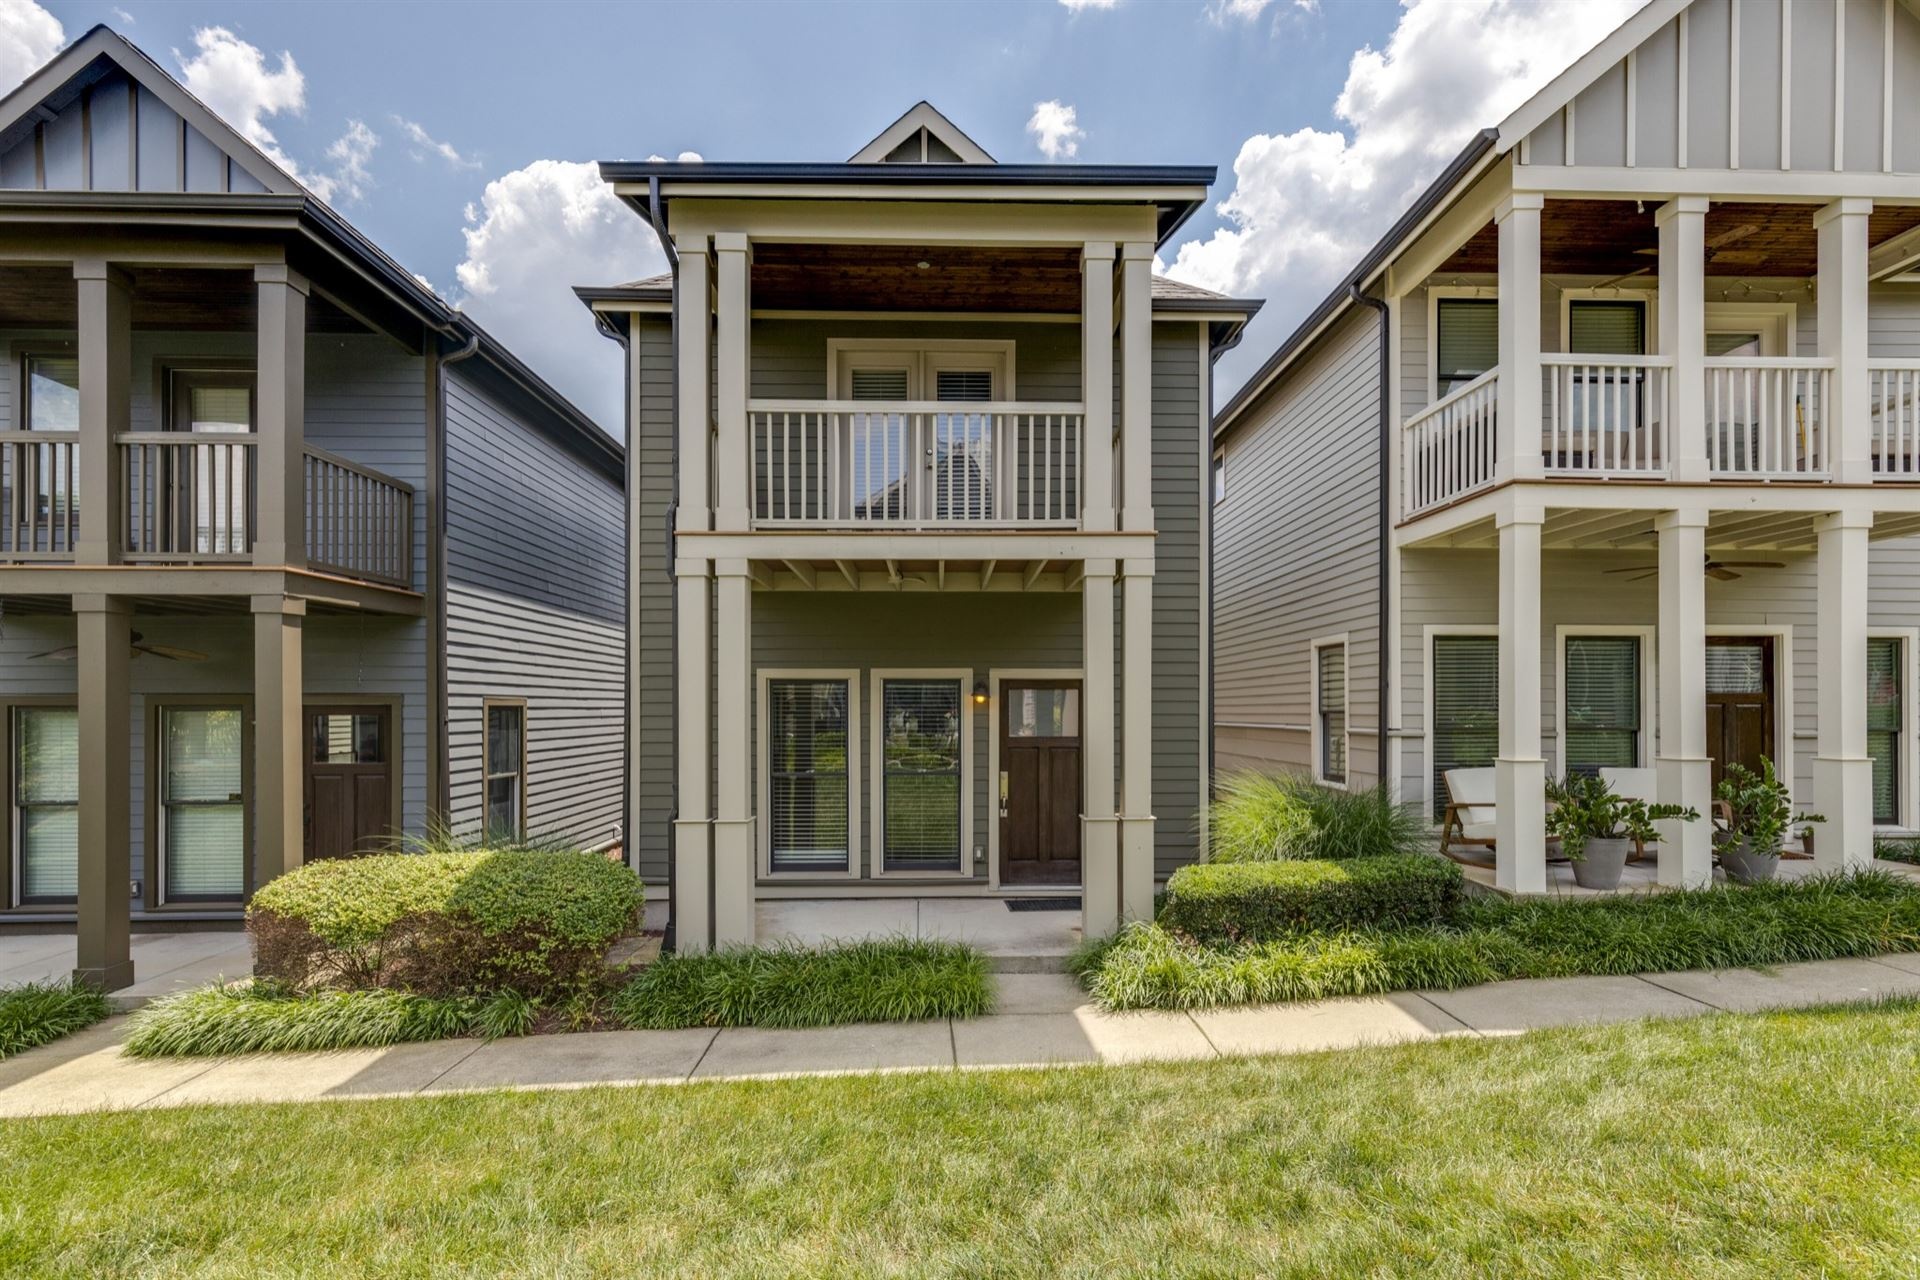 204 Copley Ln, Nashville, TN 37204 - MLS#: 2264014